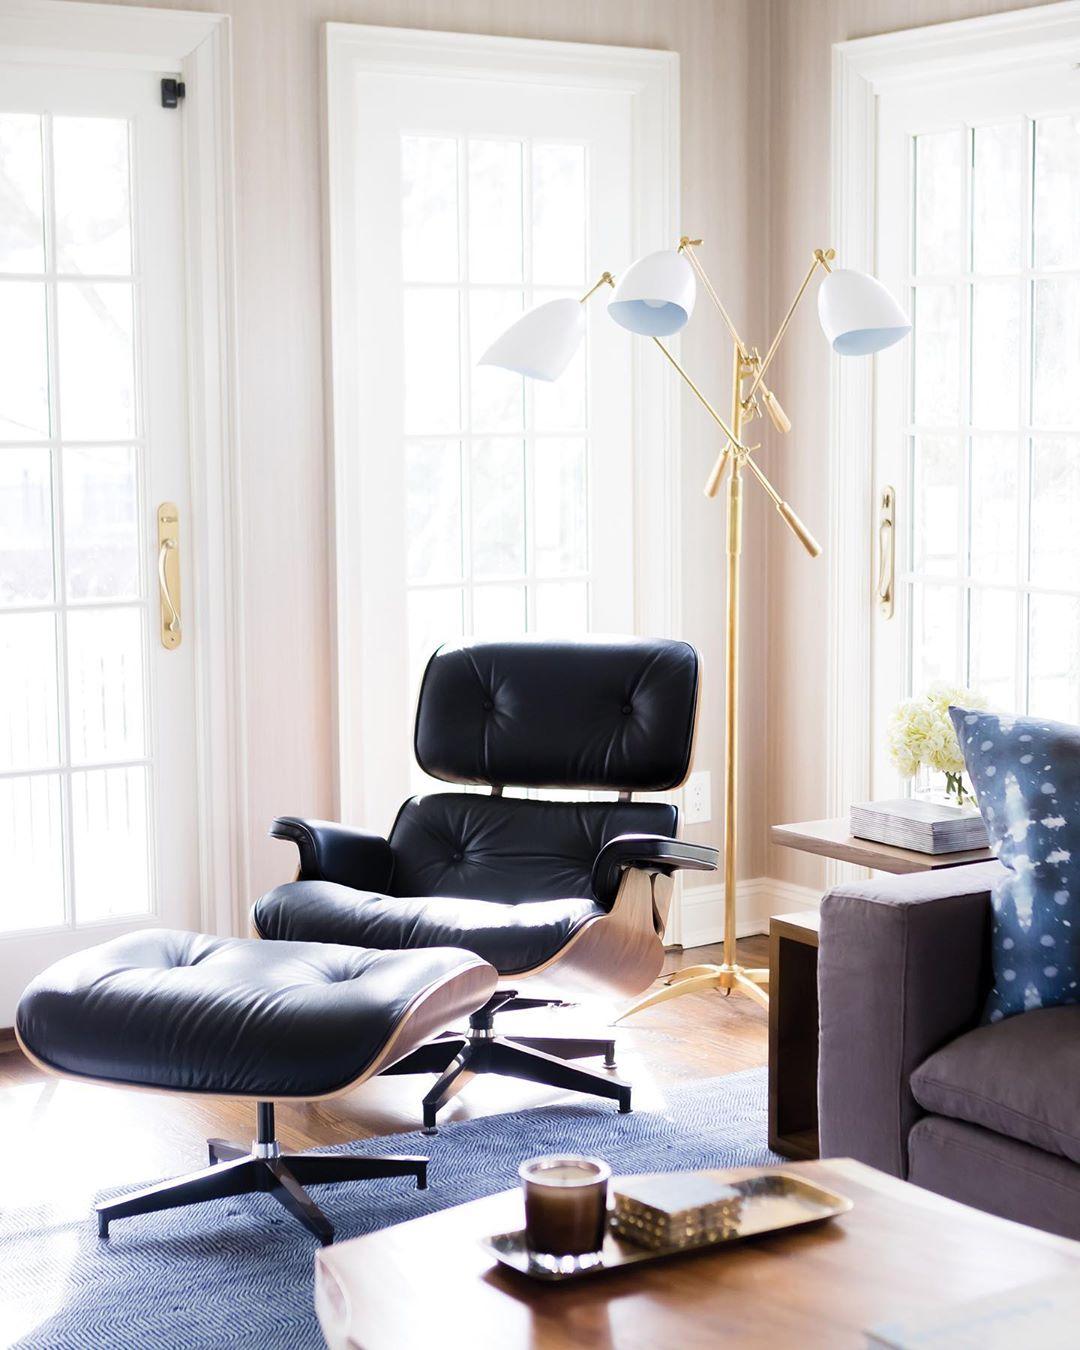 Choose the best lighting for your reading corner 08